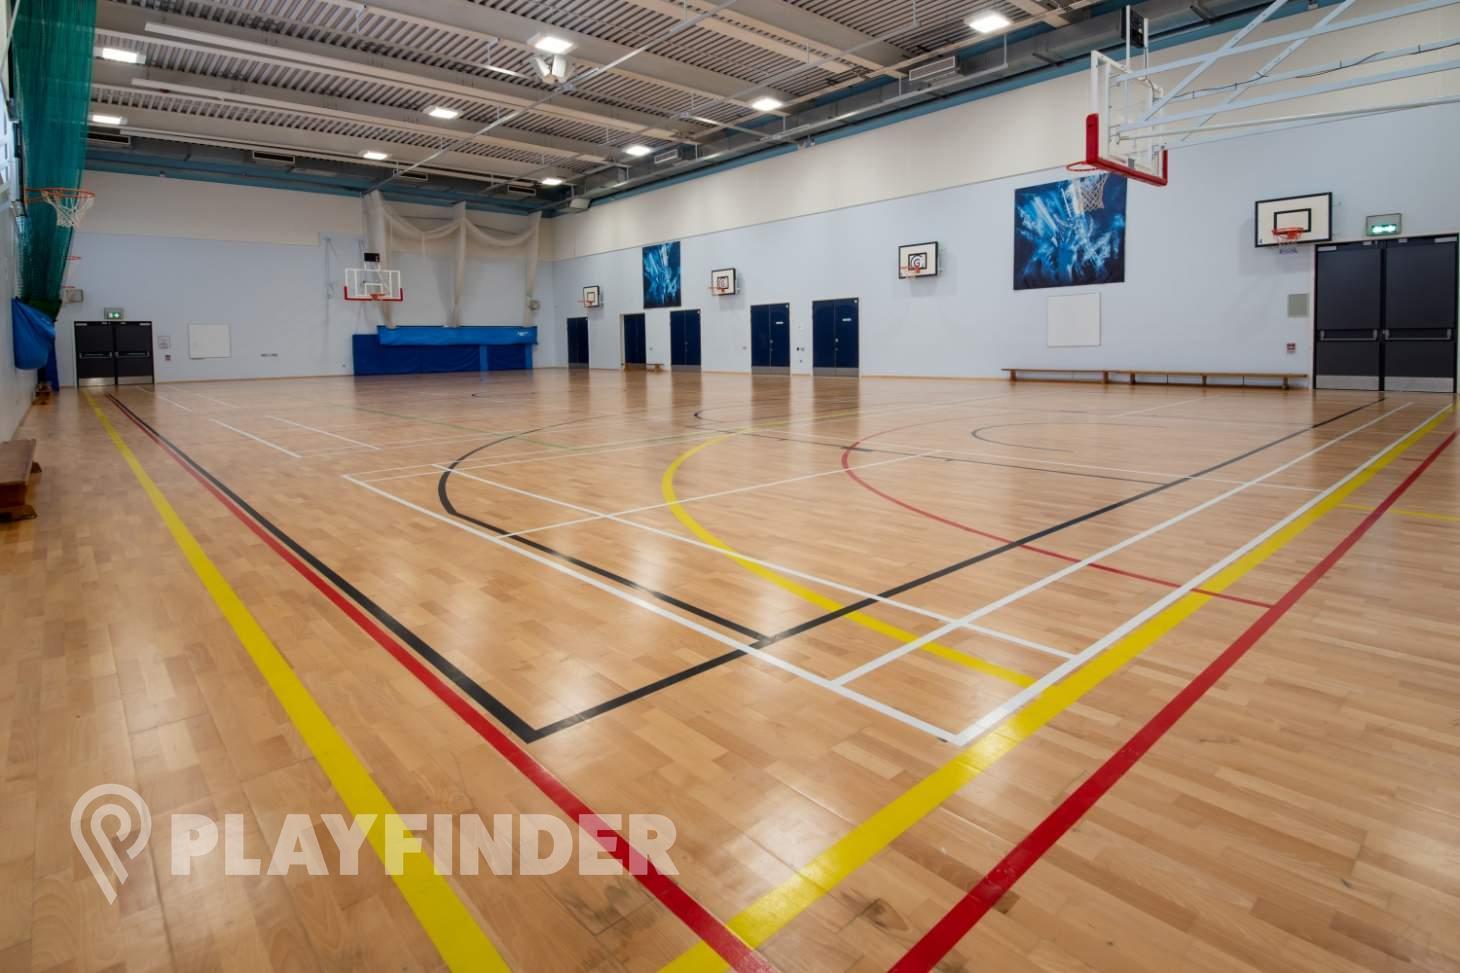 Harris Academy St Johns Wood Court | Sports hall basketball court